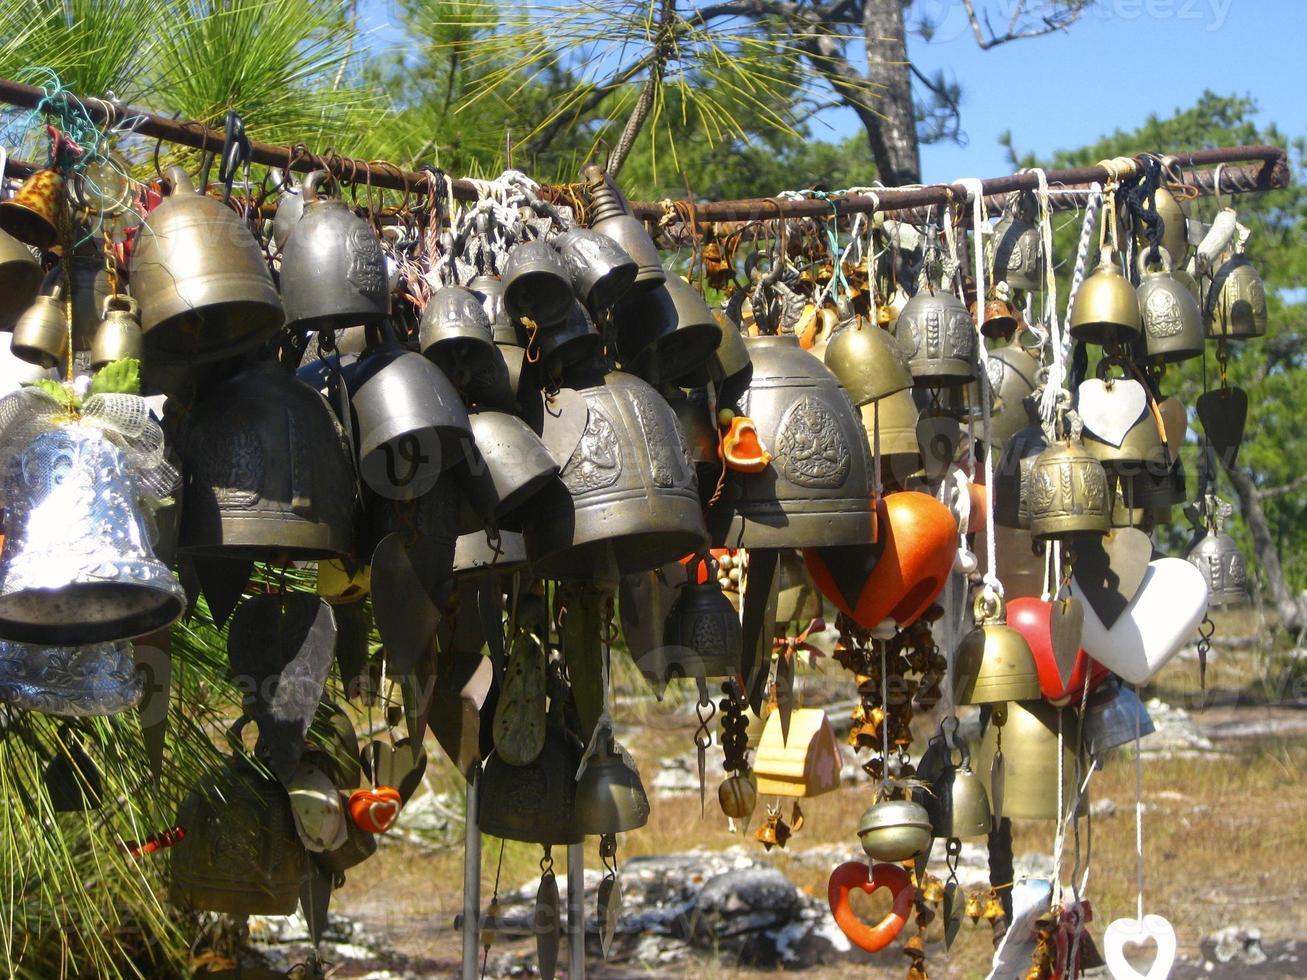 pendaison de cloches en Thaïlande photo